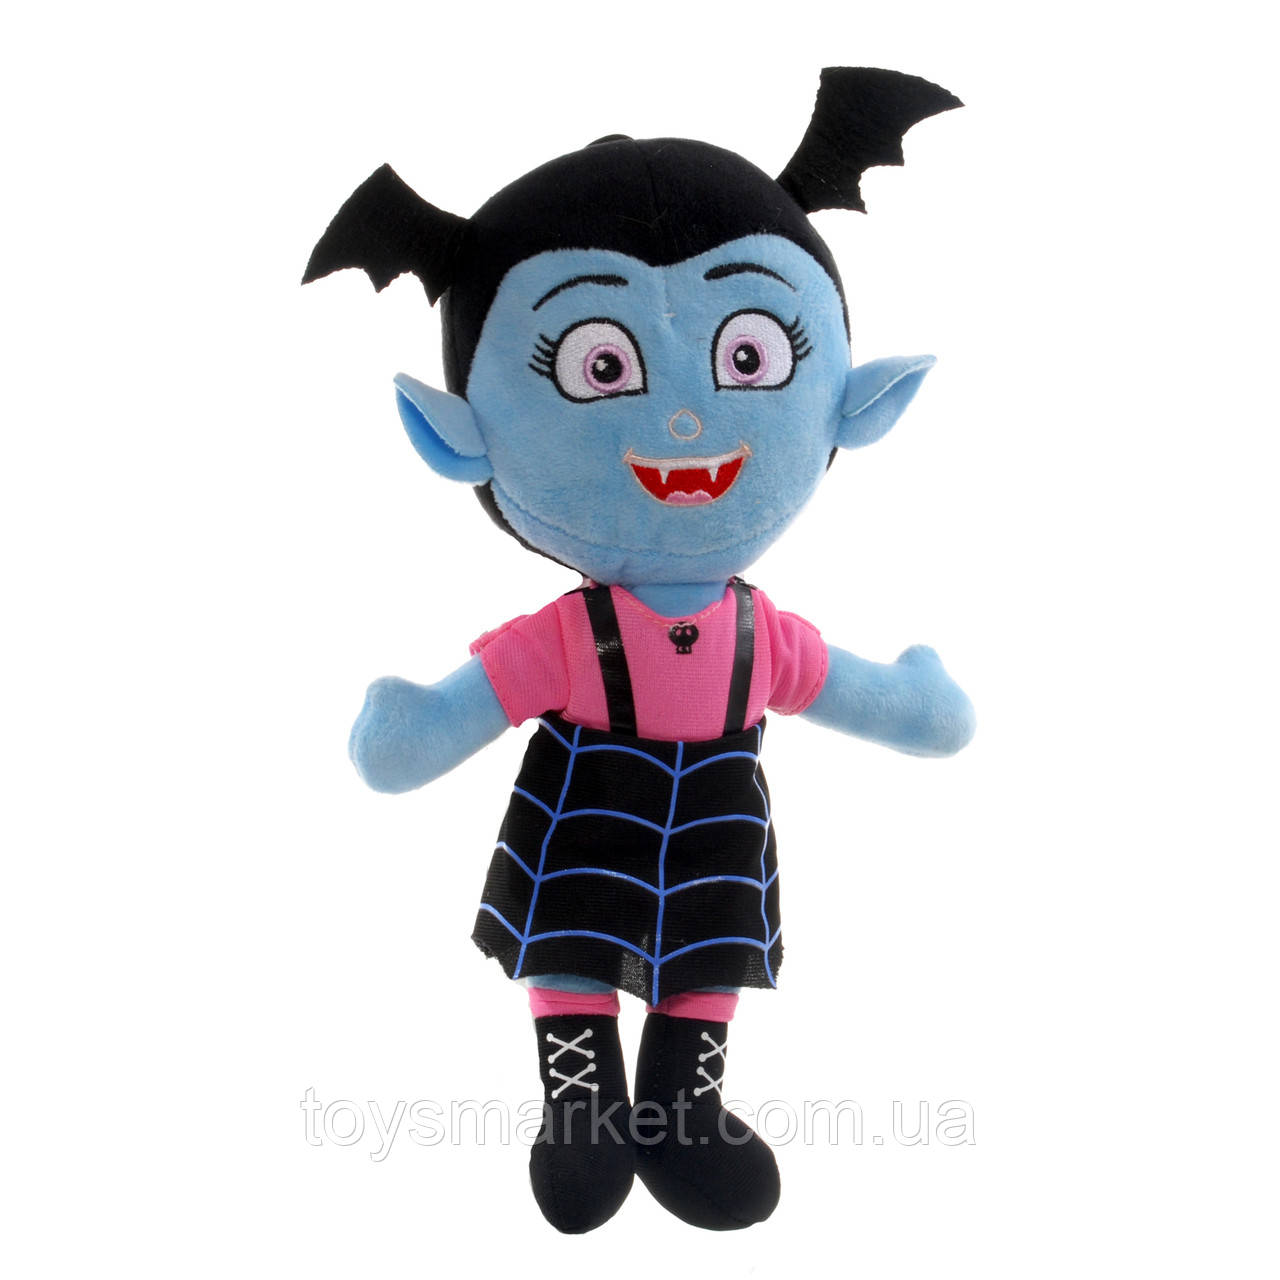 Мягкая игрушка Vampirina, Вампирина